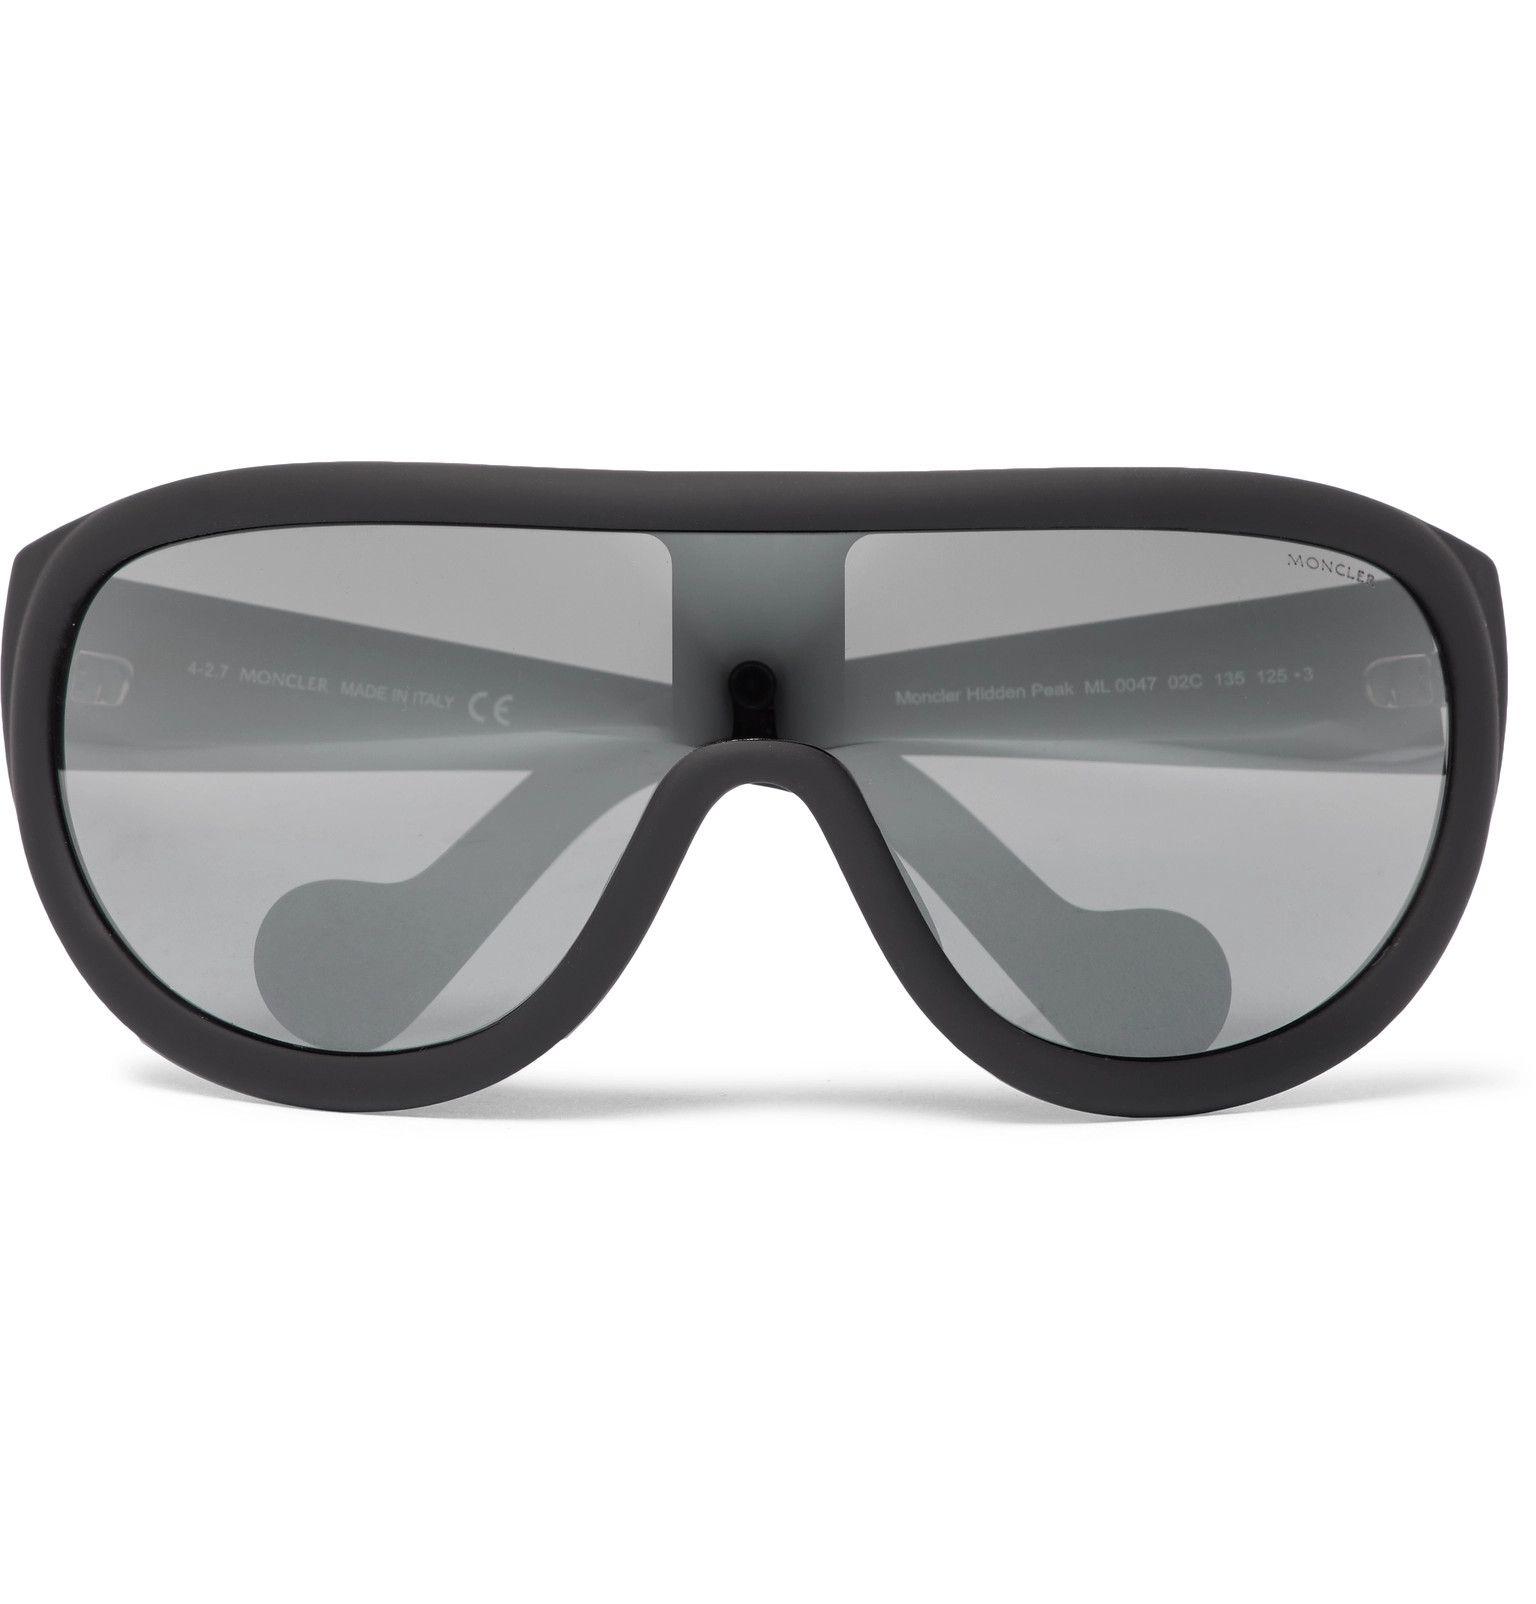 6d0209f84a78 Moncler - Acetate Ski Sunglasses   glasses in 2019   Ski sunglasses ...